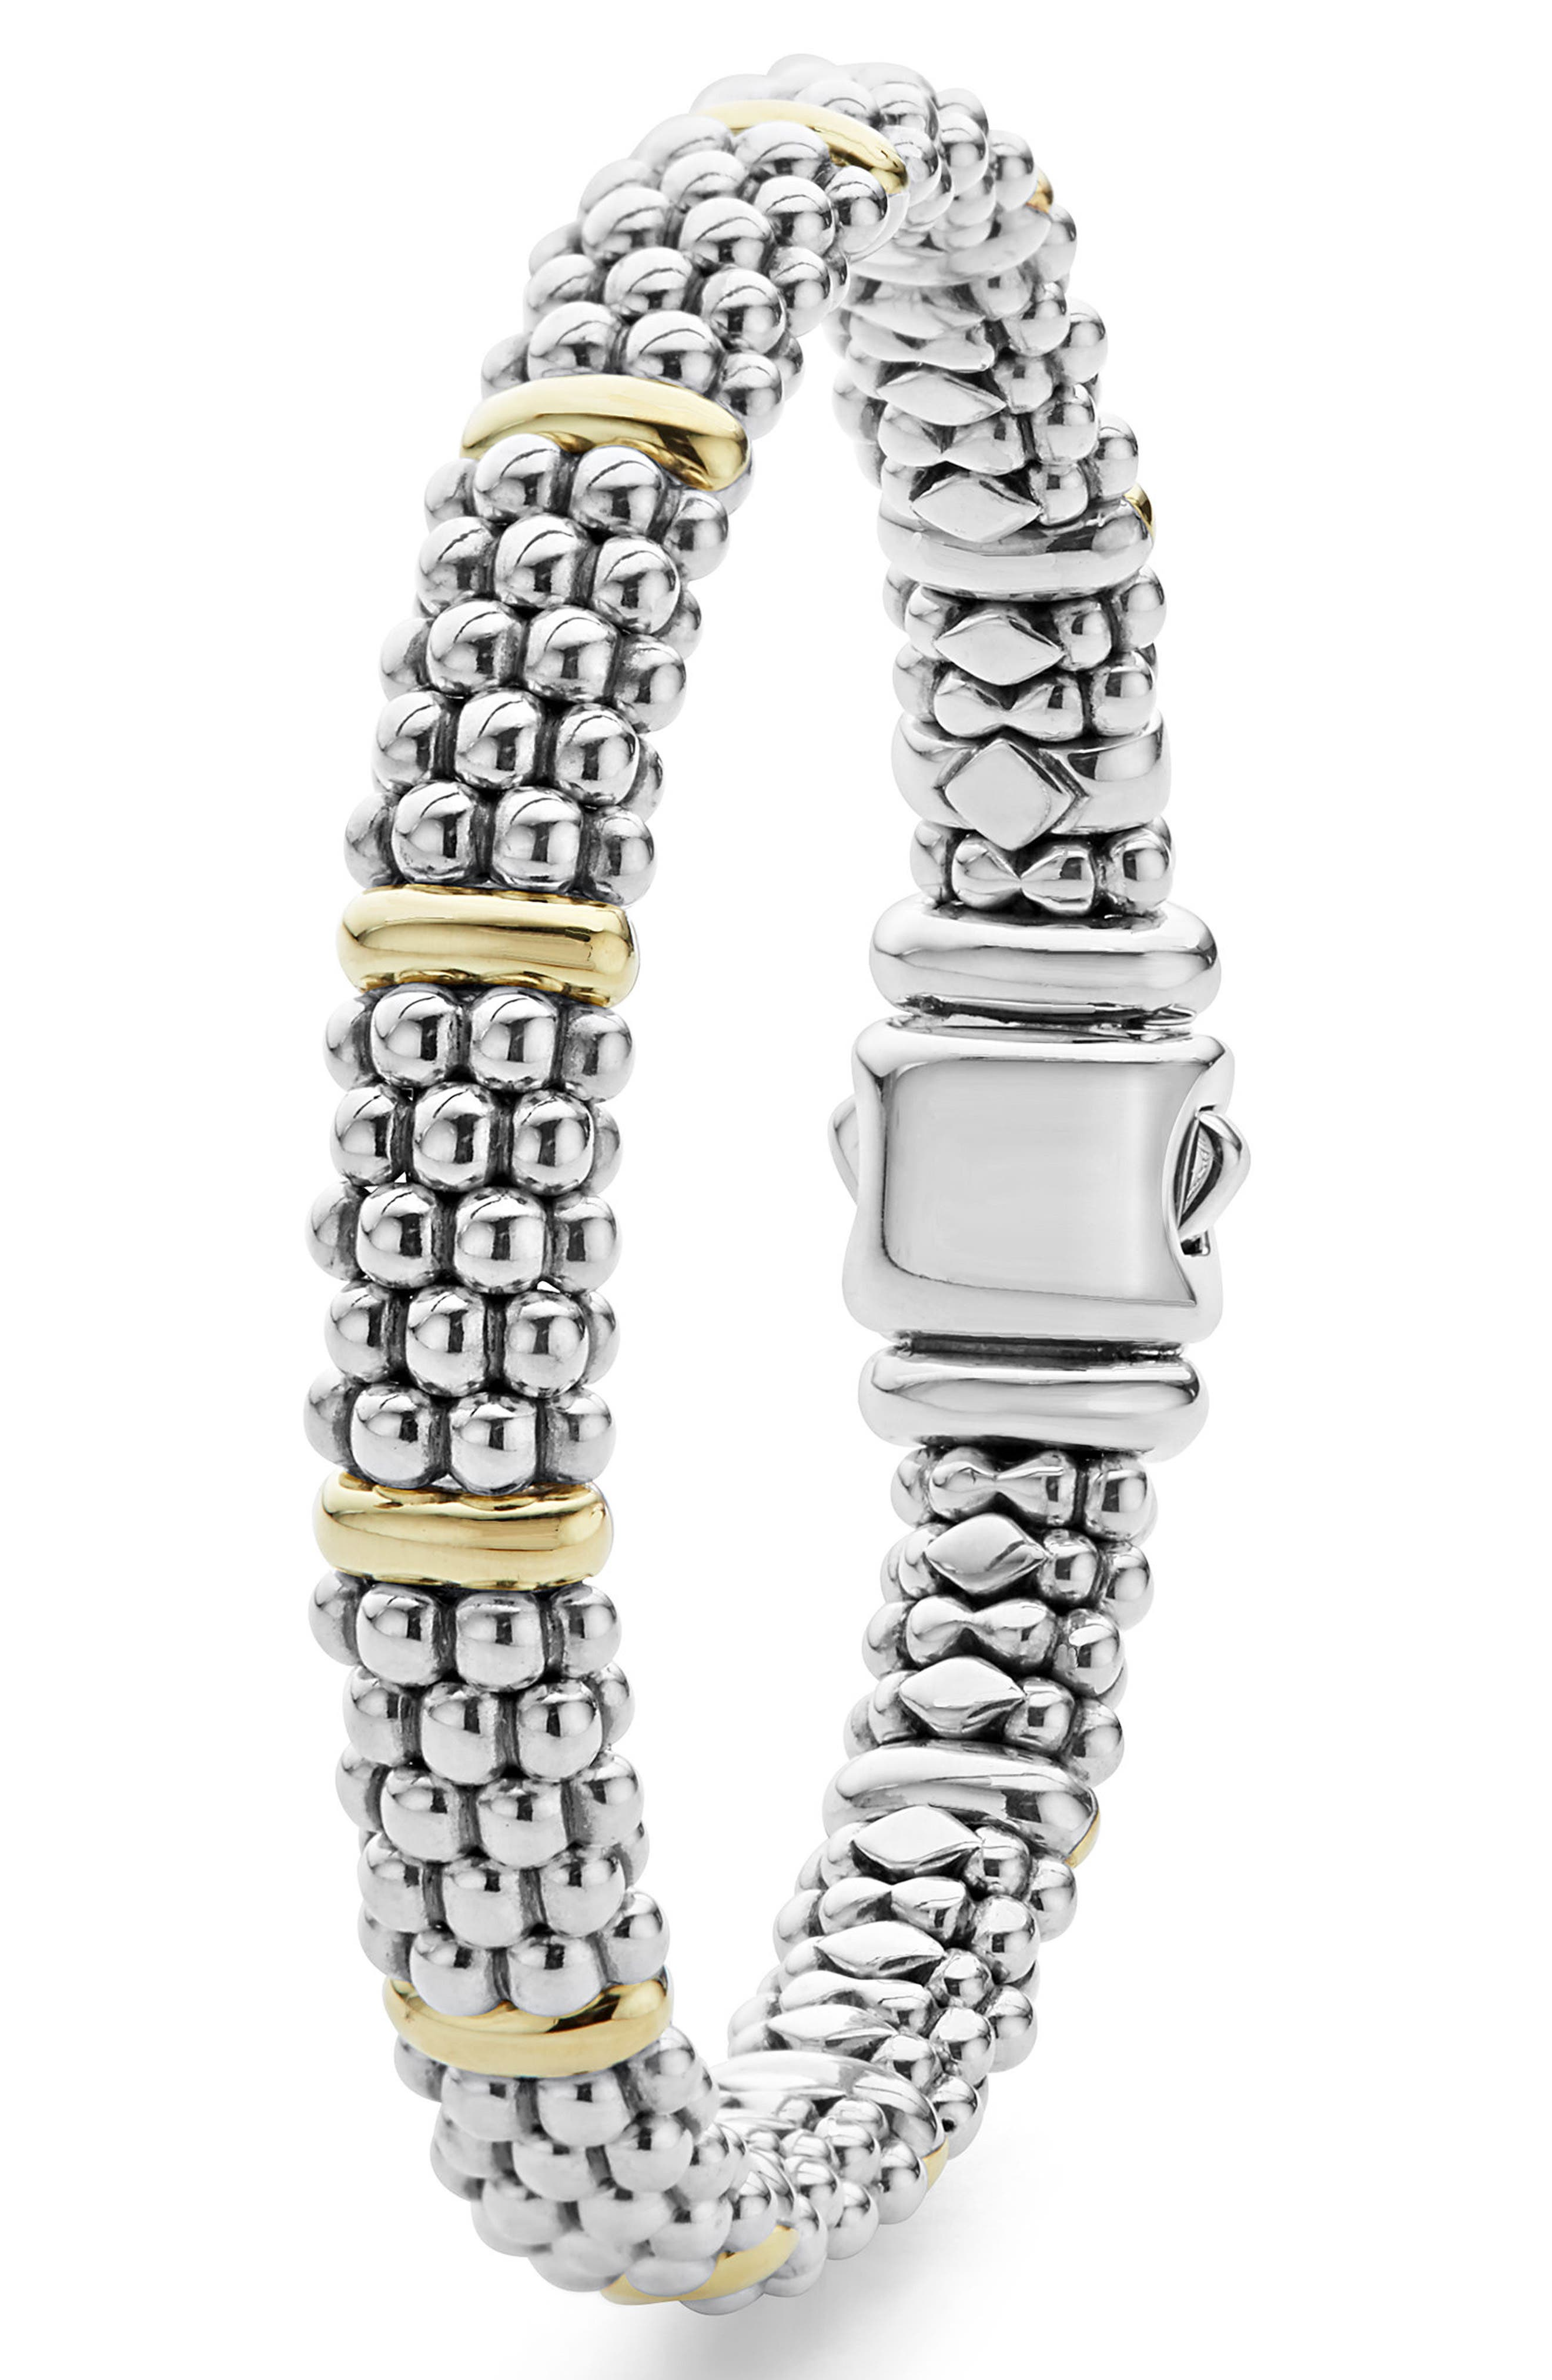 Oval Caviar Rope Bracelet,                             Alternate thumbnail 2, color,                             SILVER/ GOLD